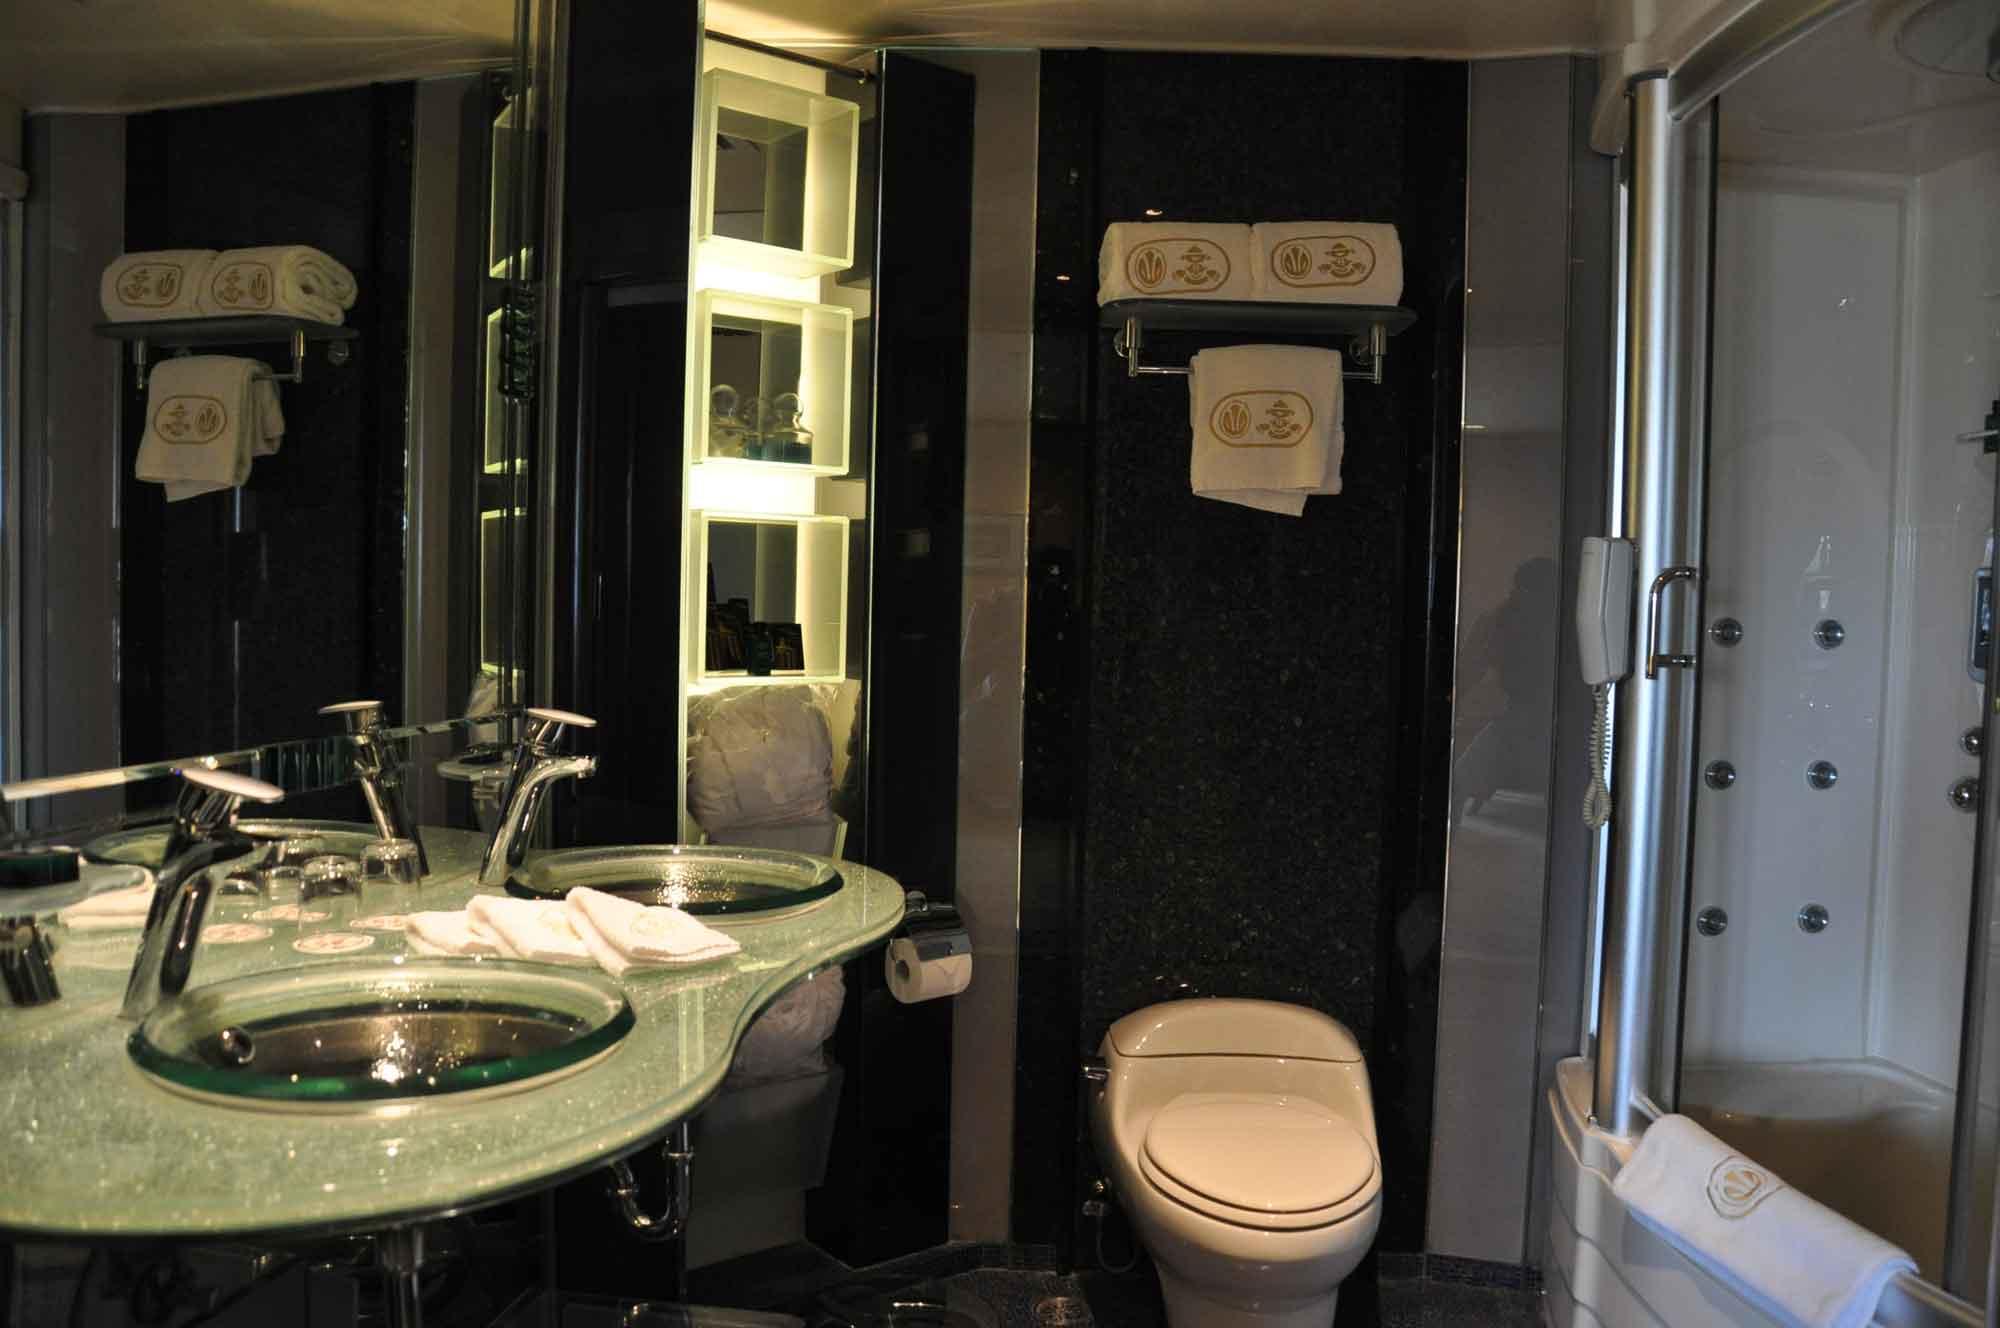 Hotel Lisboa Royal Tower Suite bathroom